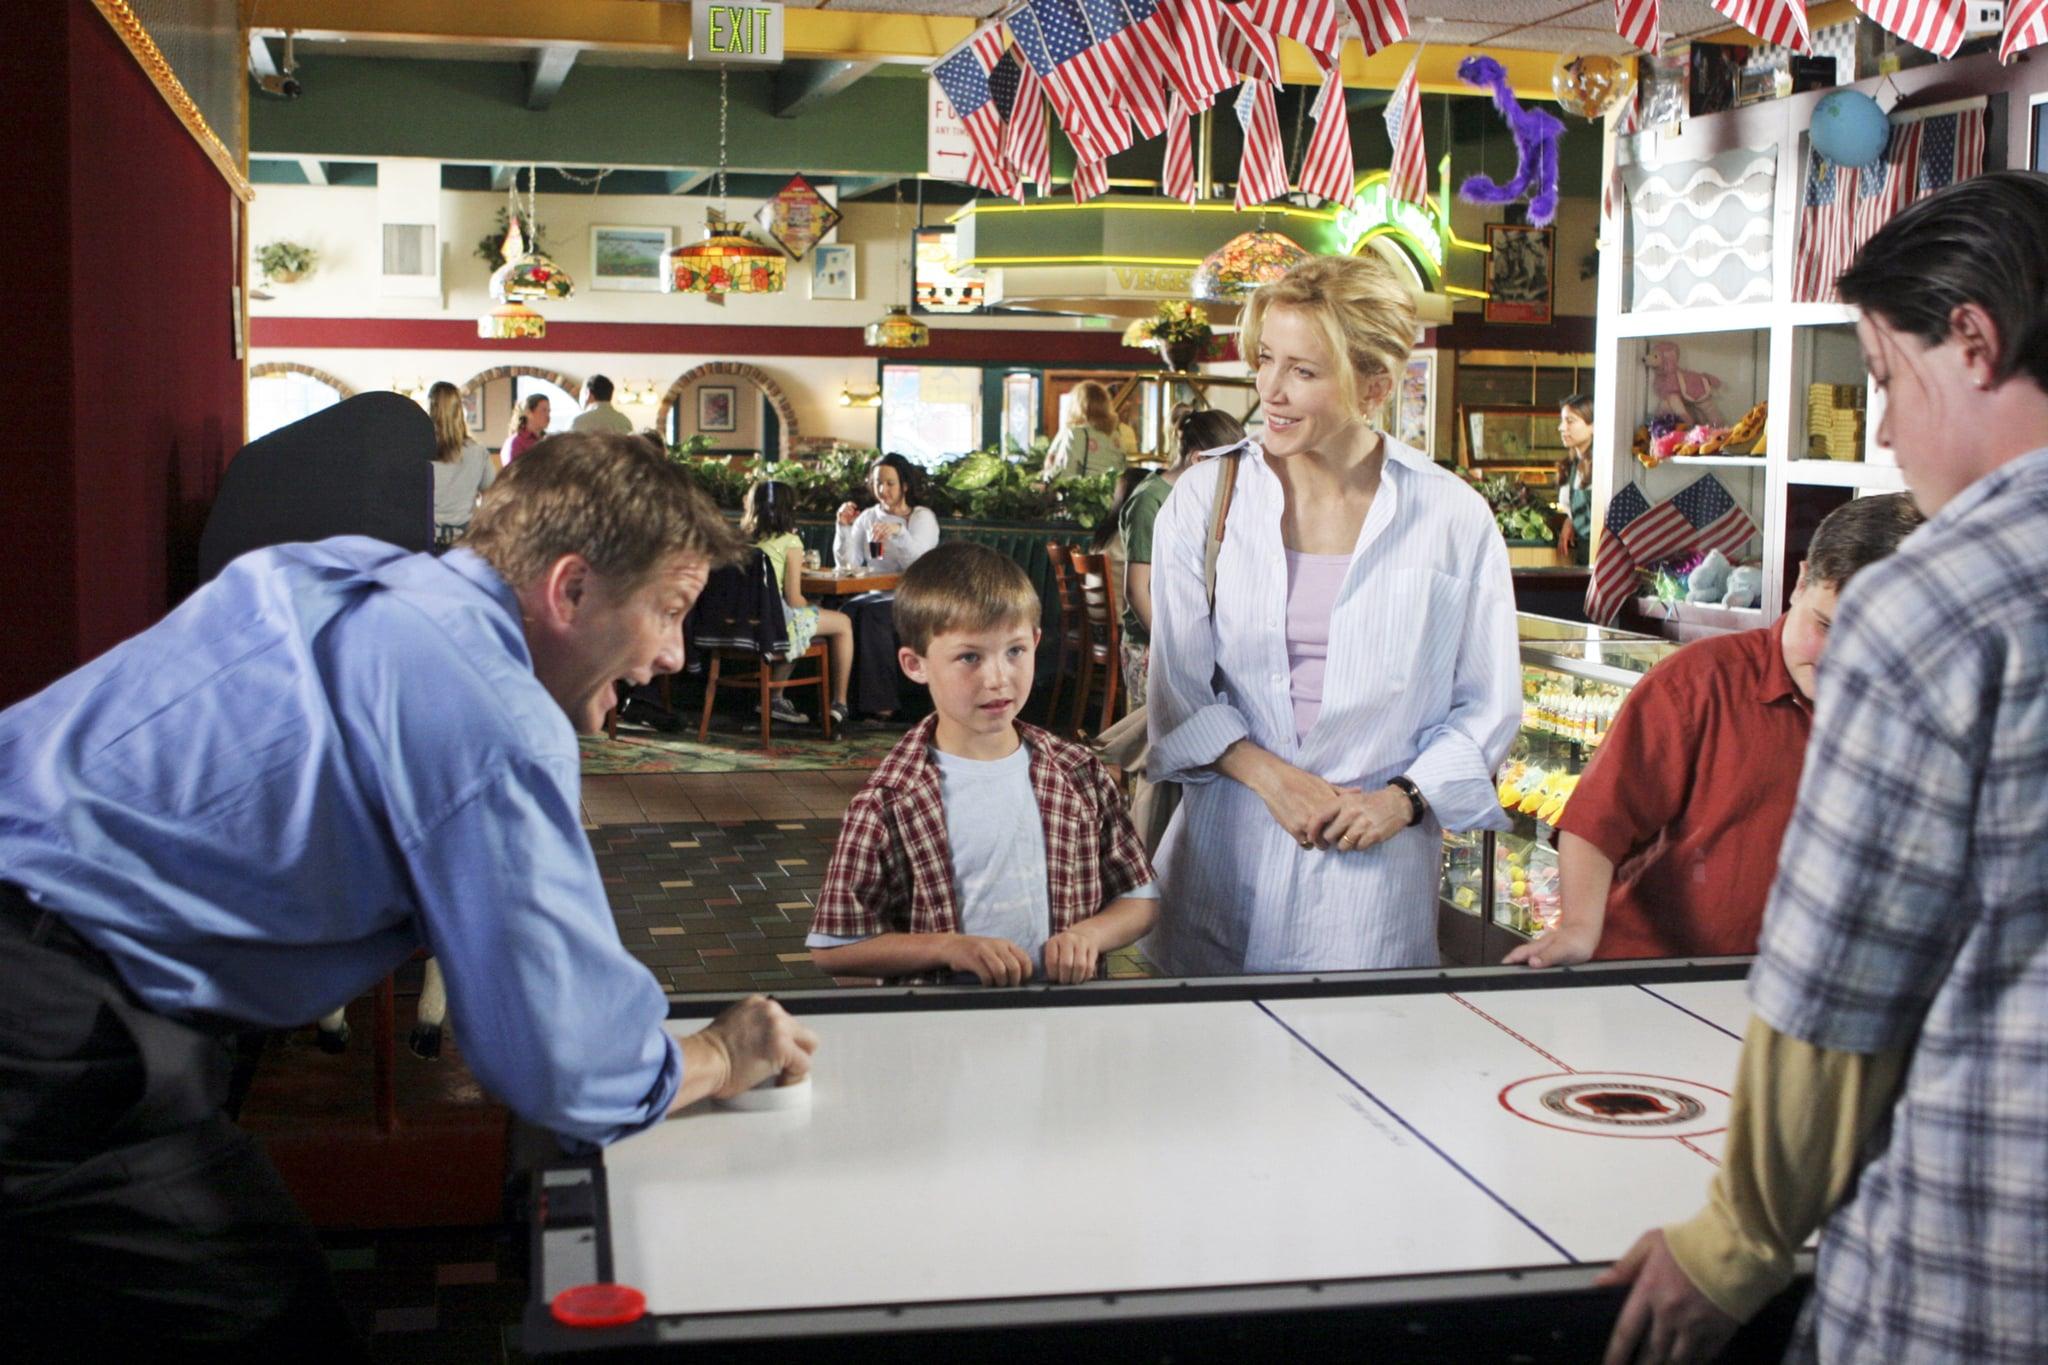 DESPERATE HOUSEWIVES, Doug Savant (left), Felicity Huffman (centre), 'One Wonderful Day', (Season 1, ep. 123), 2004-, photo: Danny Feld /  ABC / Courtesy: Everett Collection